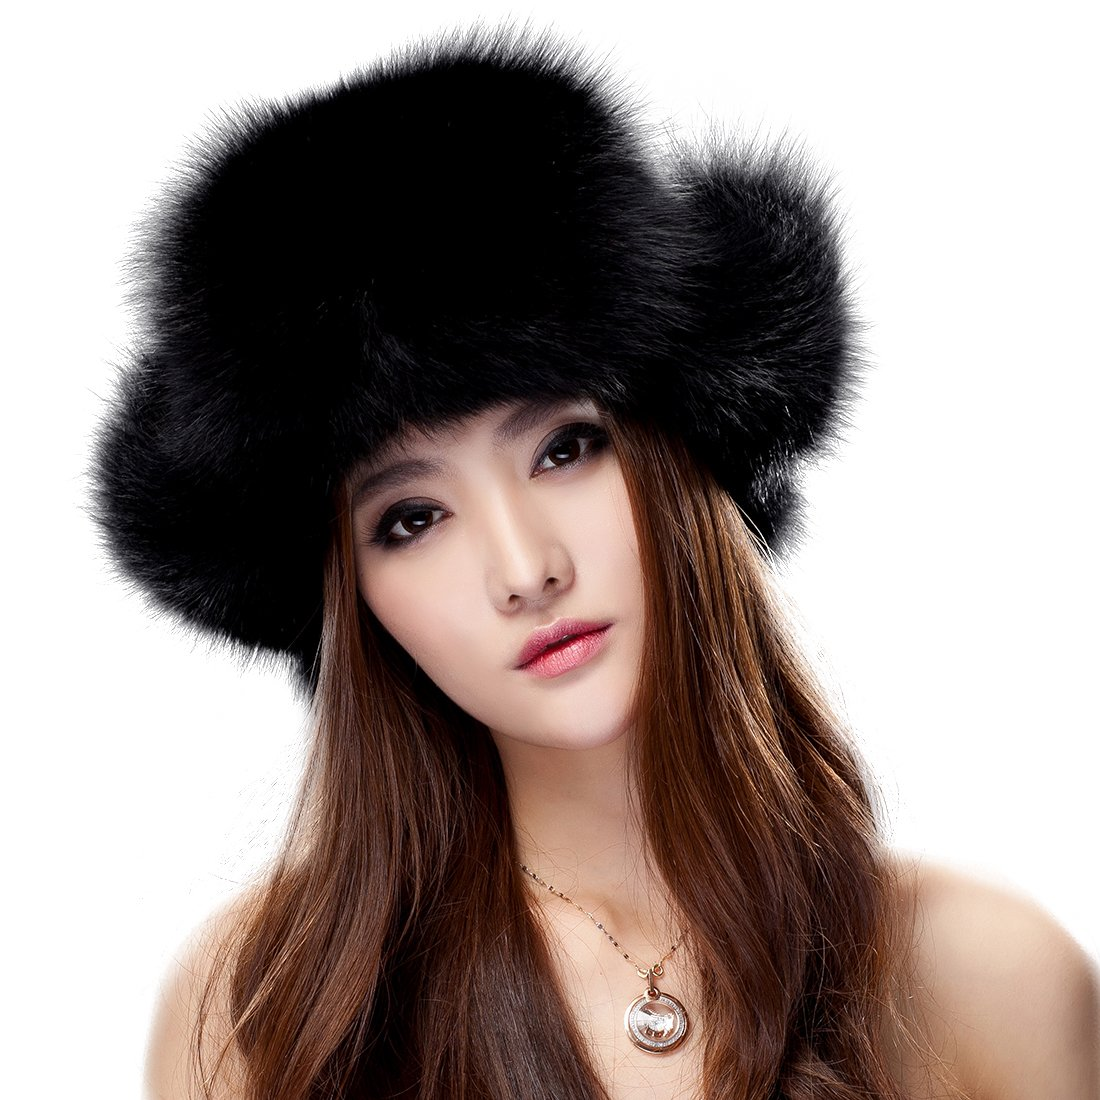 URSFUR Womens Black Fox Fur & Fabric Russian Ushanka Trapper Hat with Pom Poms by URSFUR